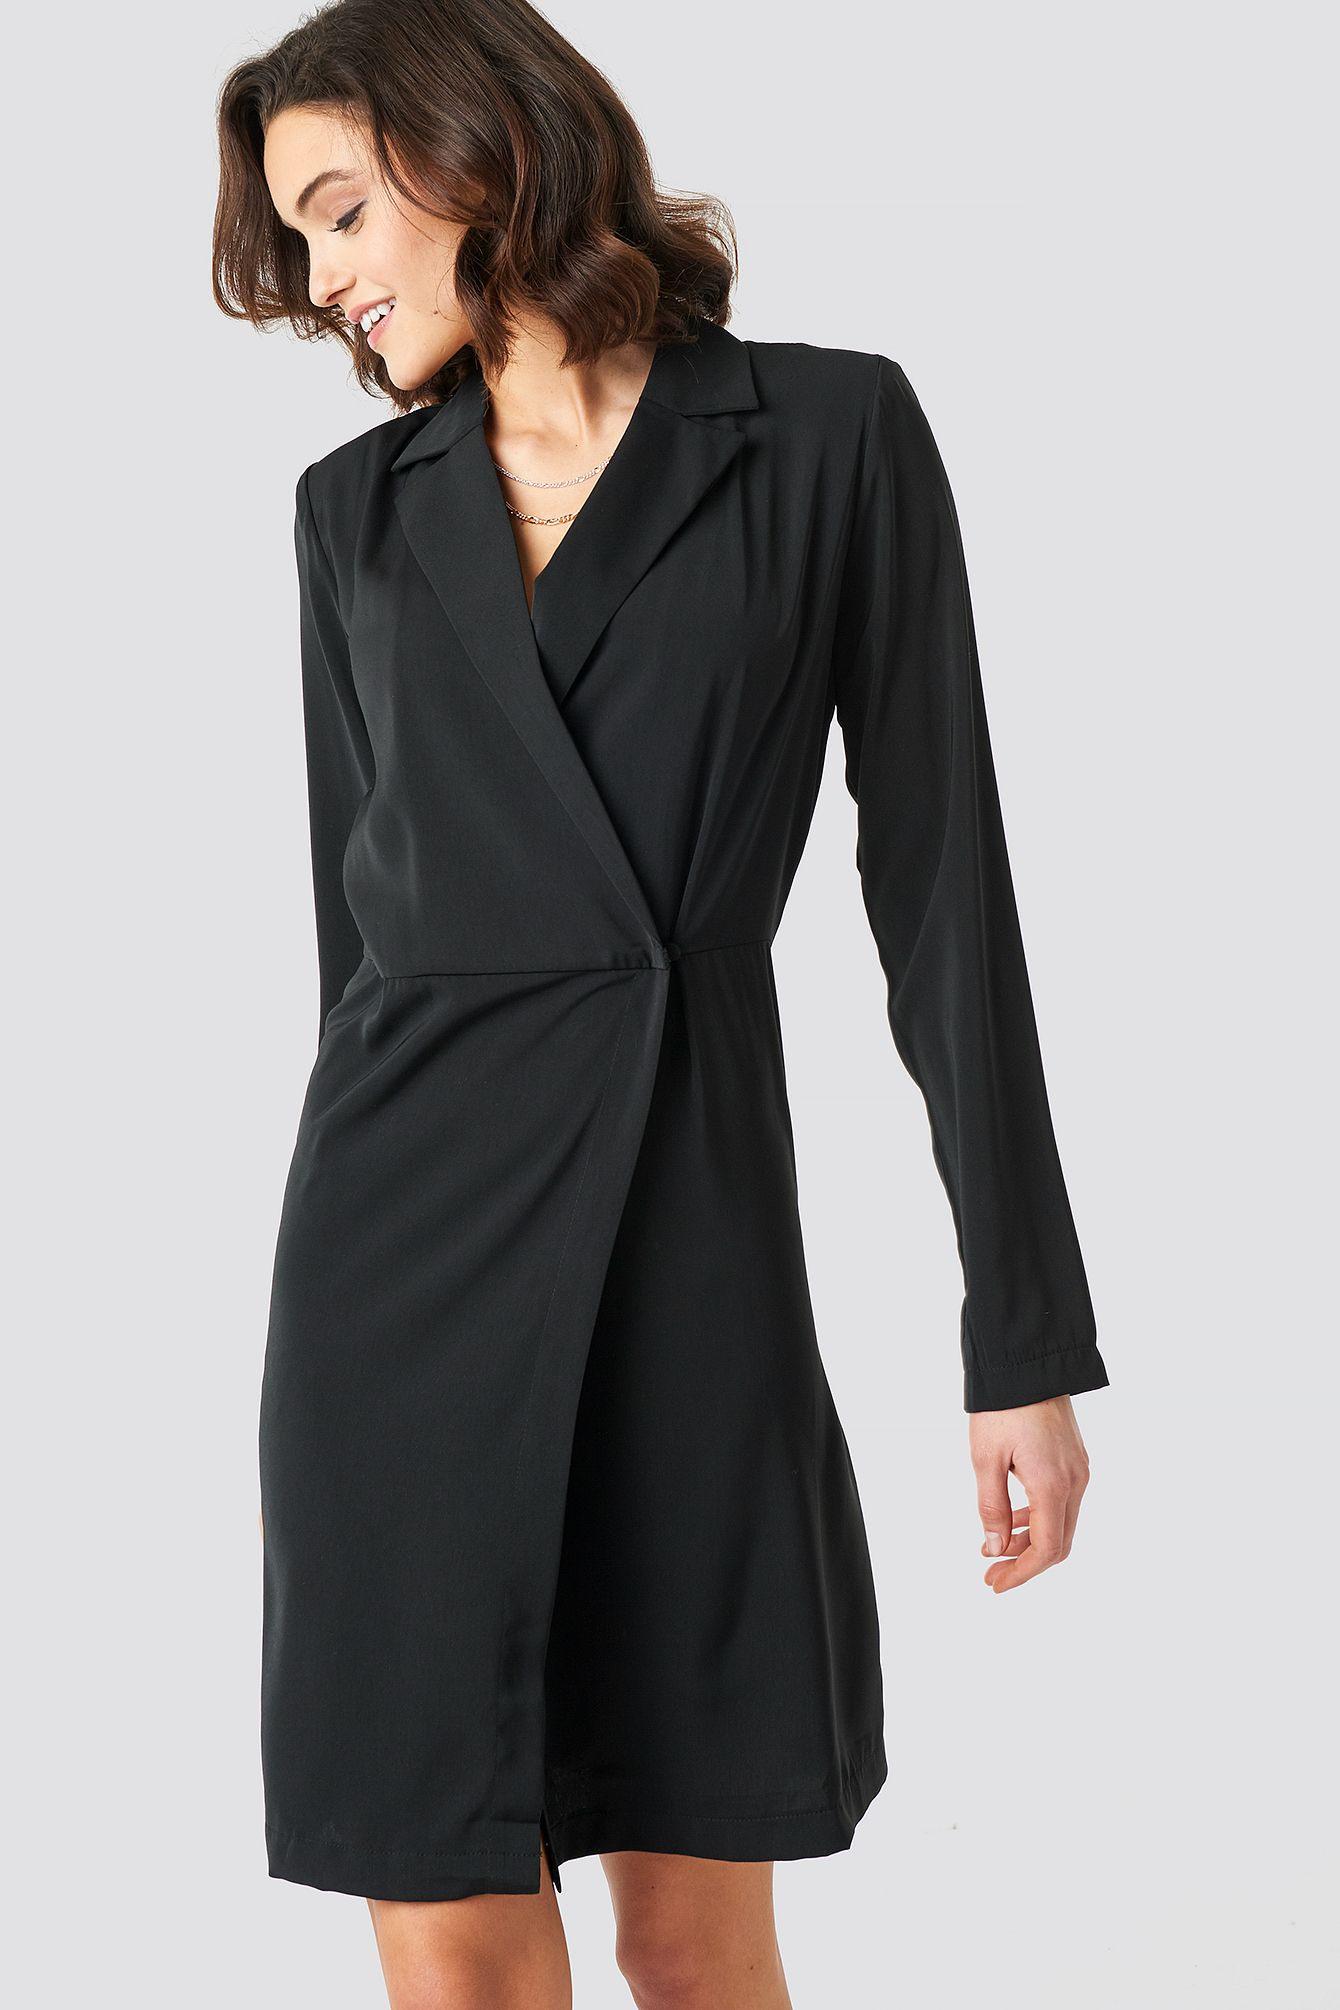 Nakd Party Collared Wrap Over Midi Dress  Black  Black